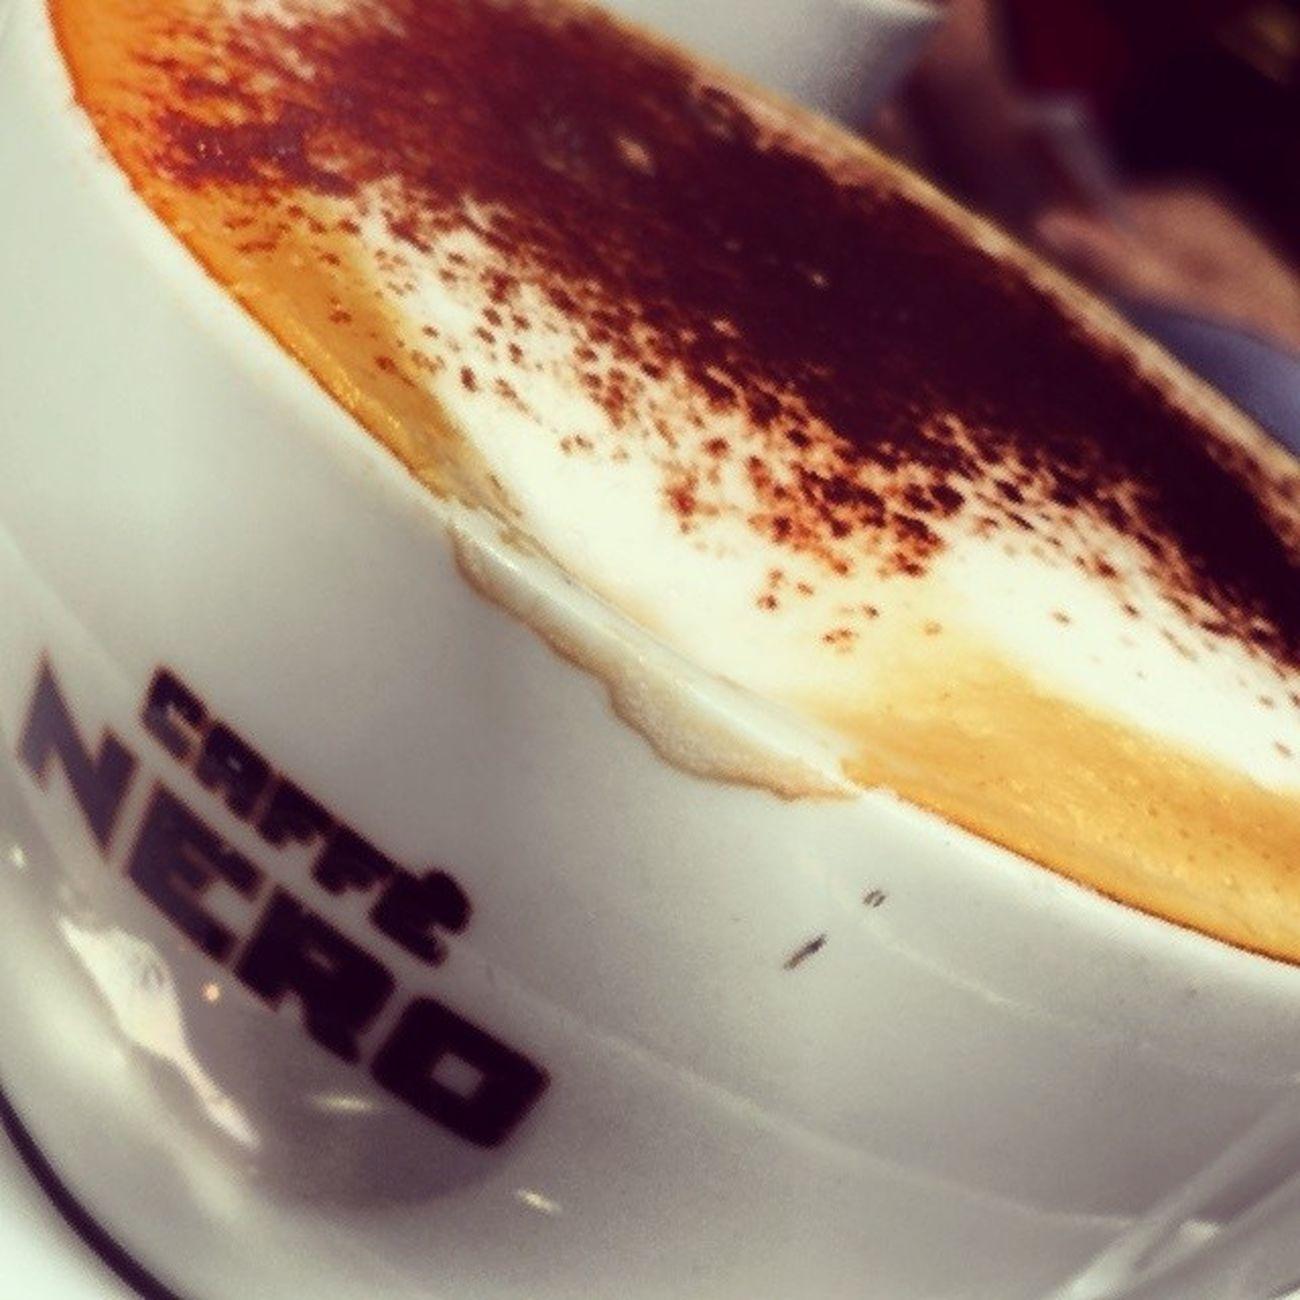 Coffee Cafe Cafenero Nero unitedkingdom england manchester